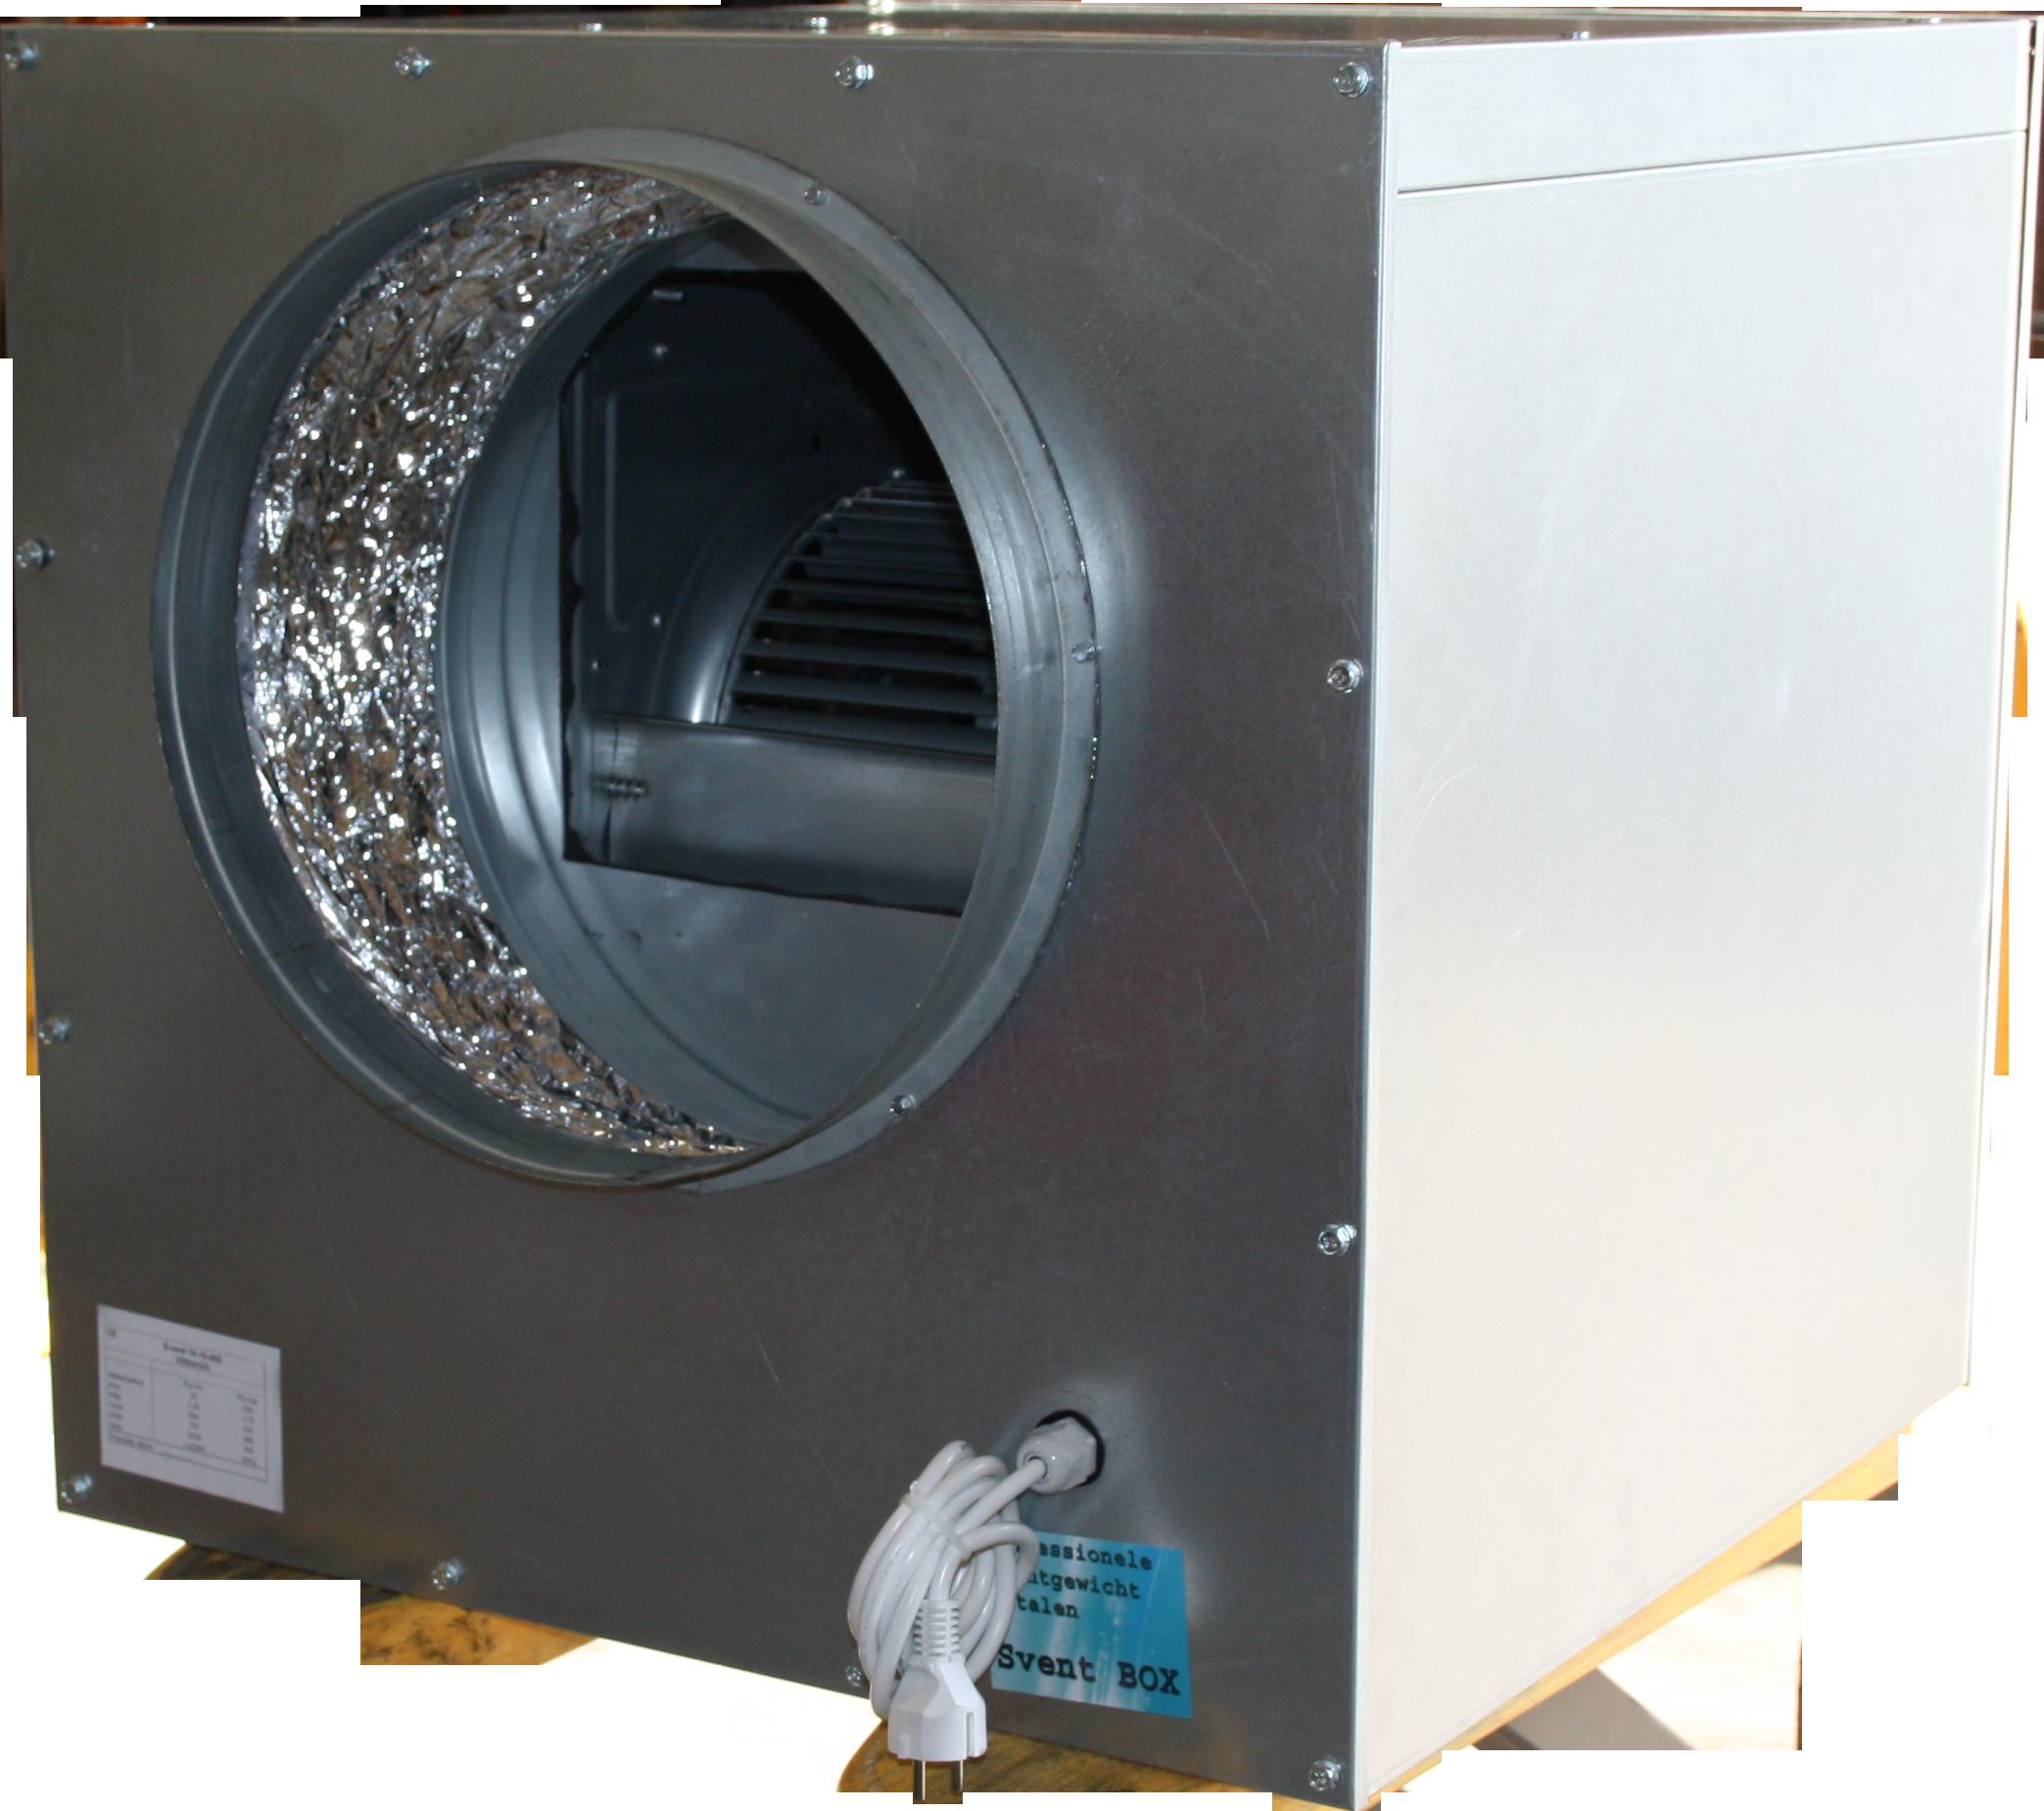 Spirototaal.nl Soft box ventilator 1200m3